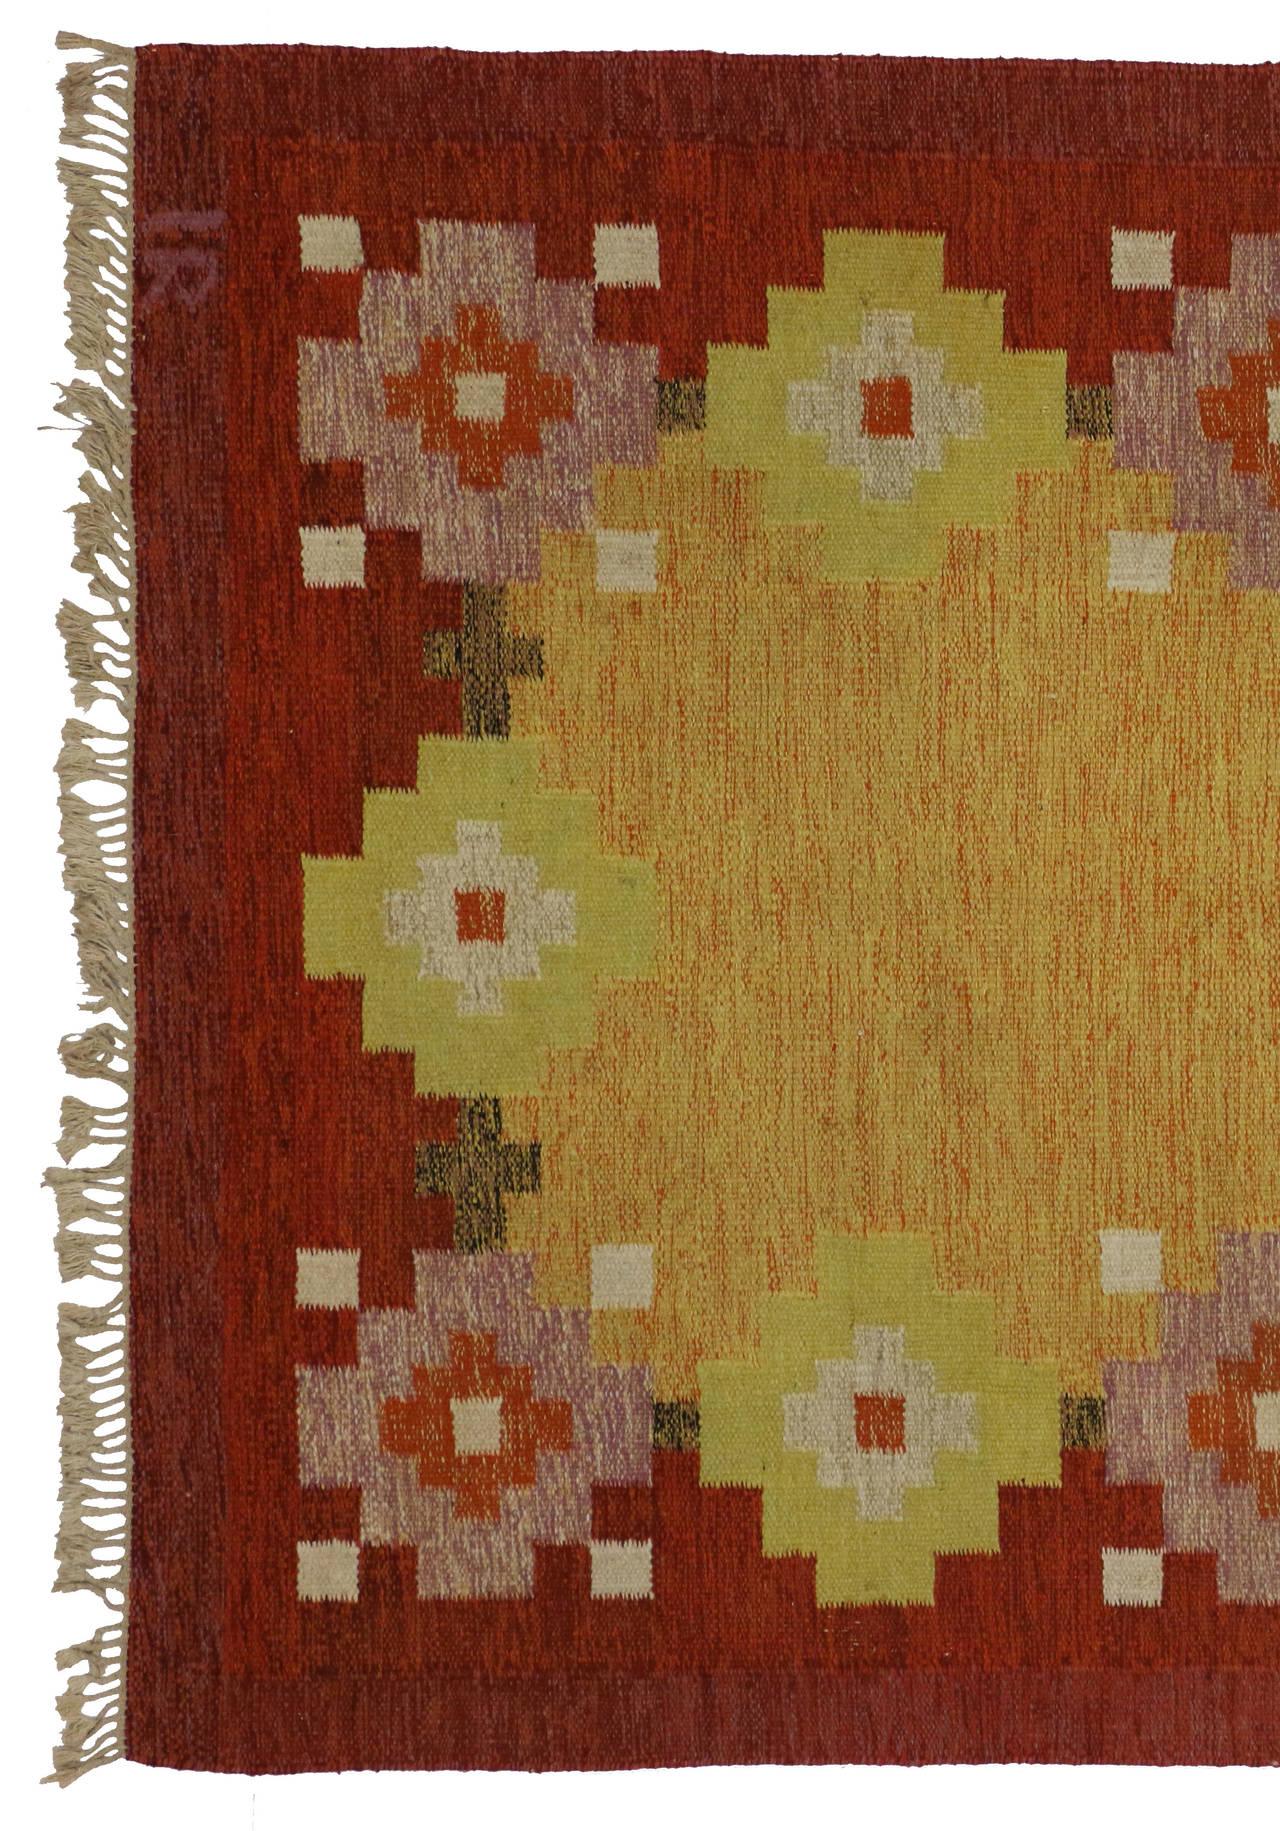 Scandinavian Modern Swedish Rollakan Kilim by Ida Rydelius, Flatweave Kilim Rug For Sale 4